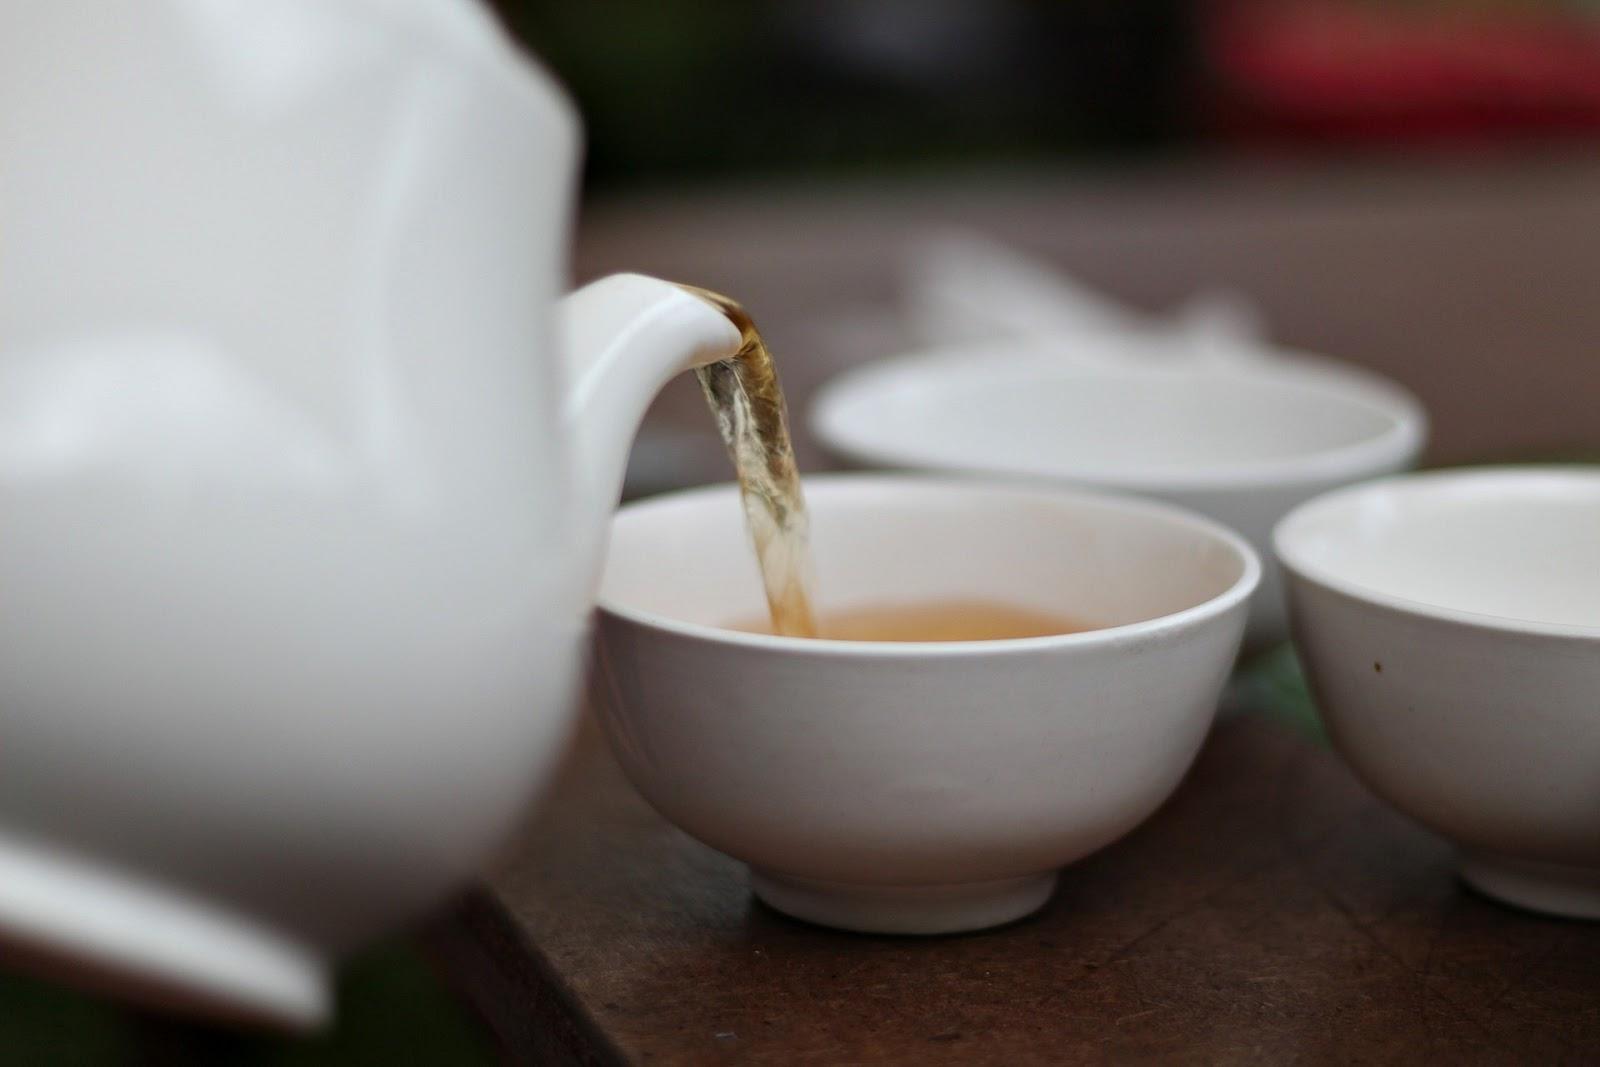 Beyaz Çay Zayıflatır Mı: Beyaz Çayla Zayıflama